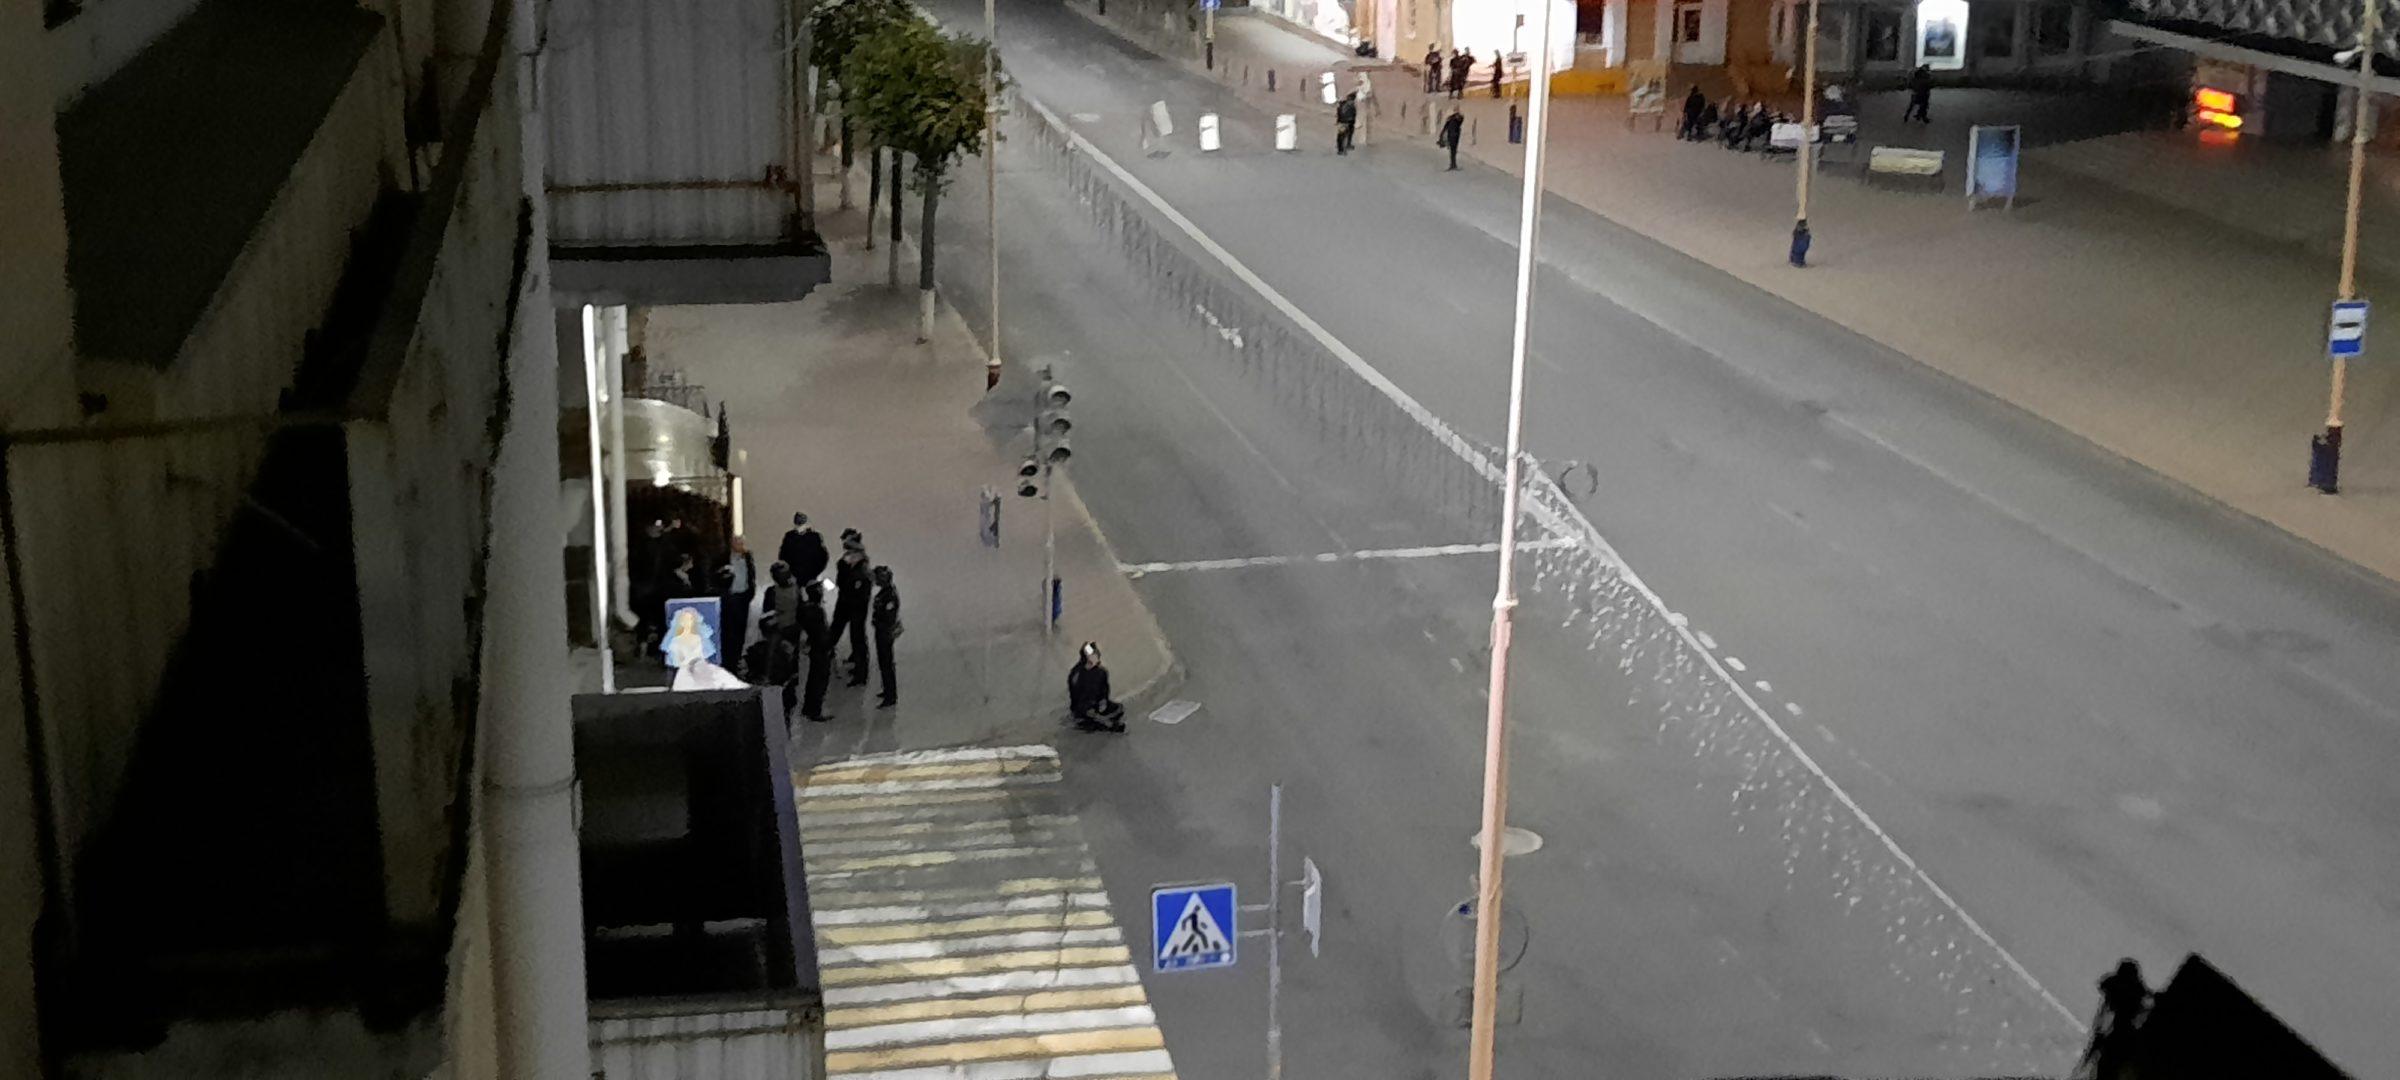 Площадь Ленина в Барановичах 12 августа. Фото: Intex-press.